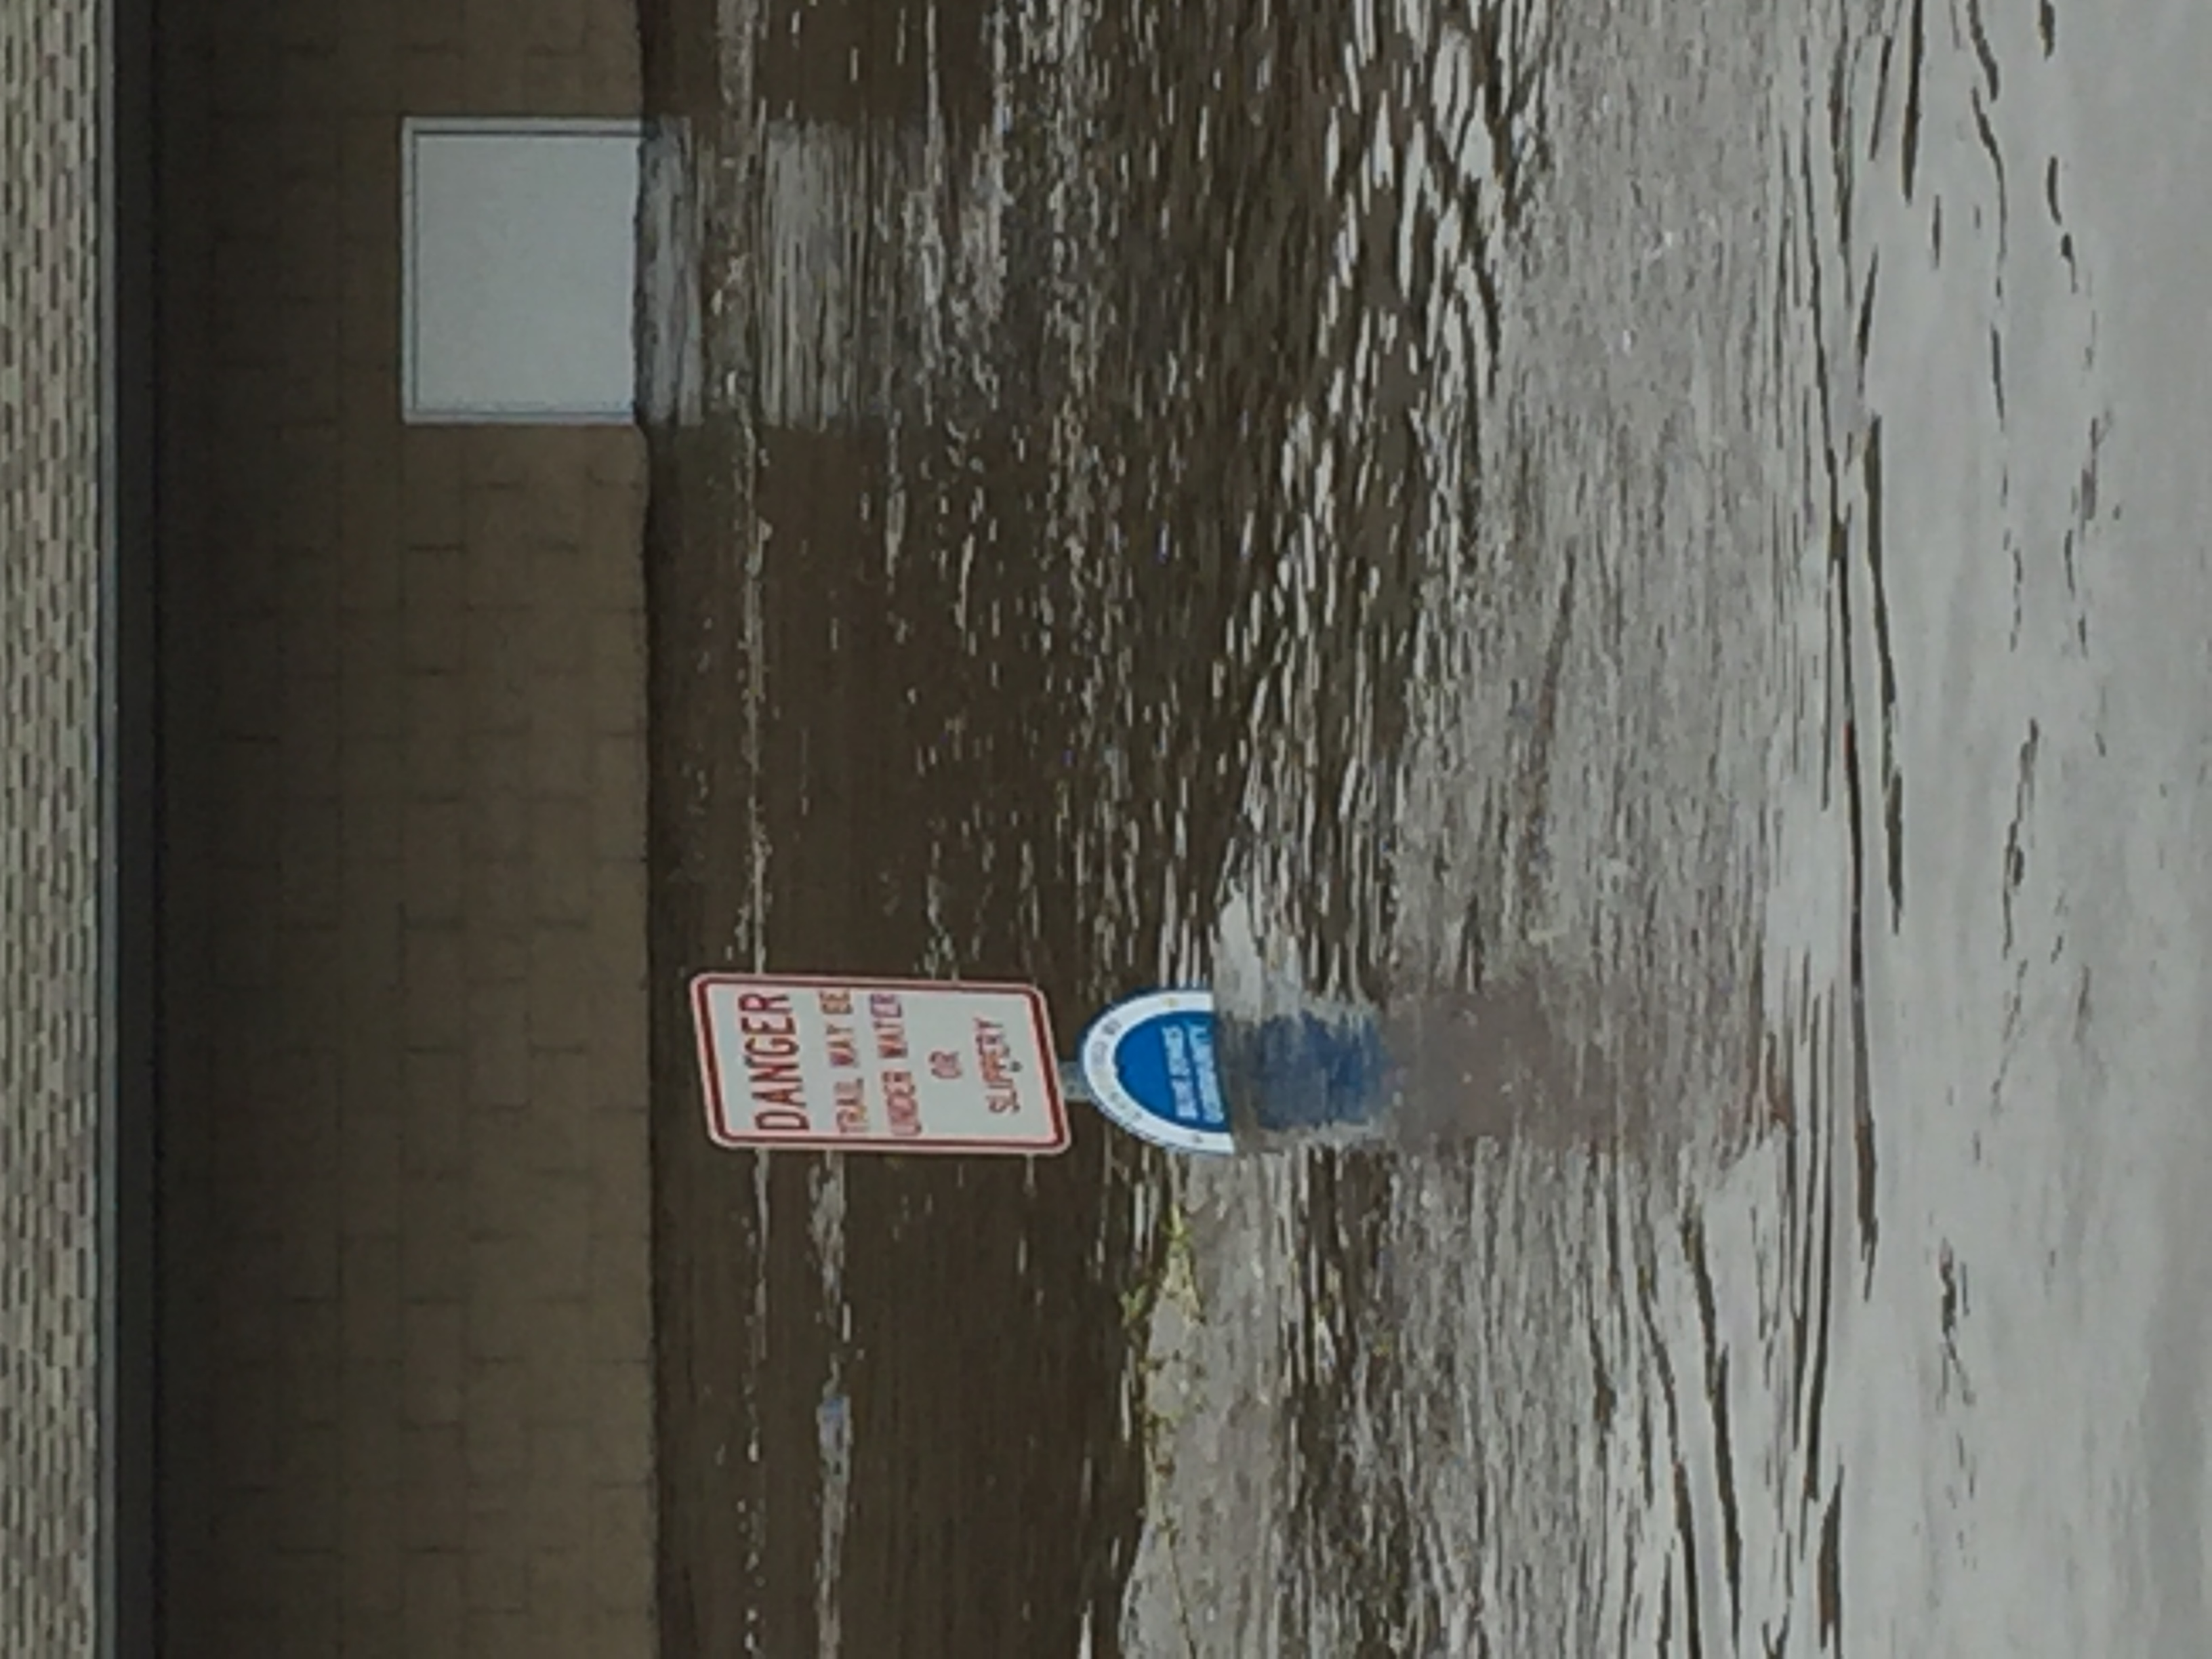 Cedar Falls flooding